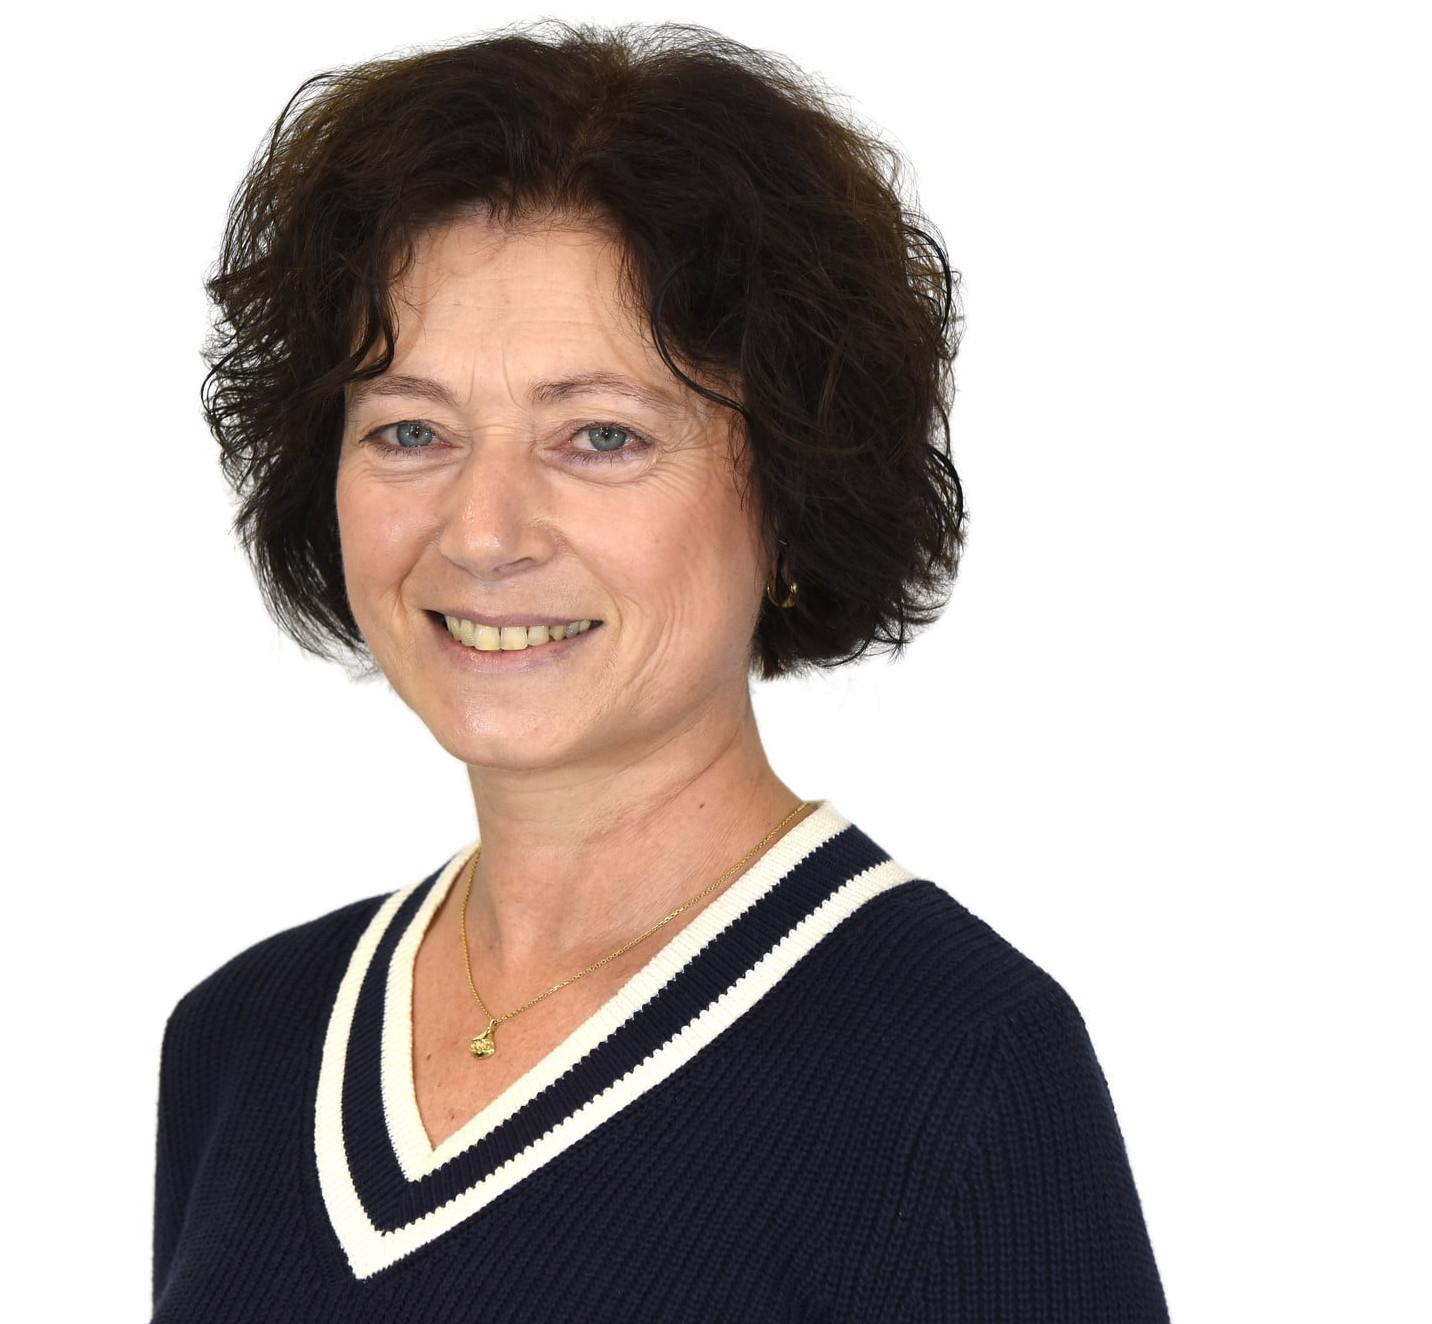 Frau Stefanie Hölldorfer